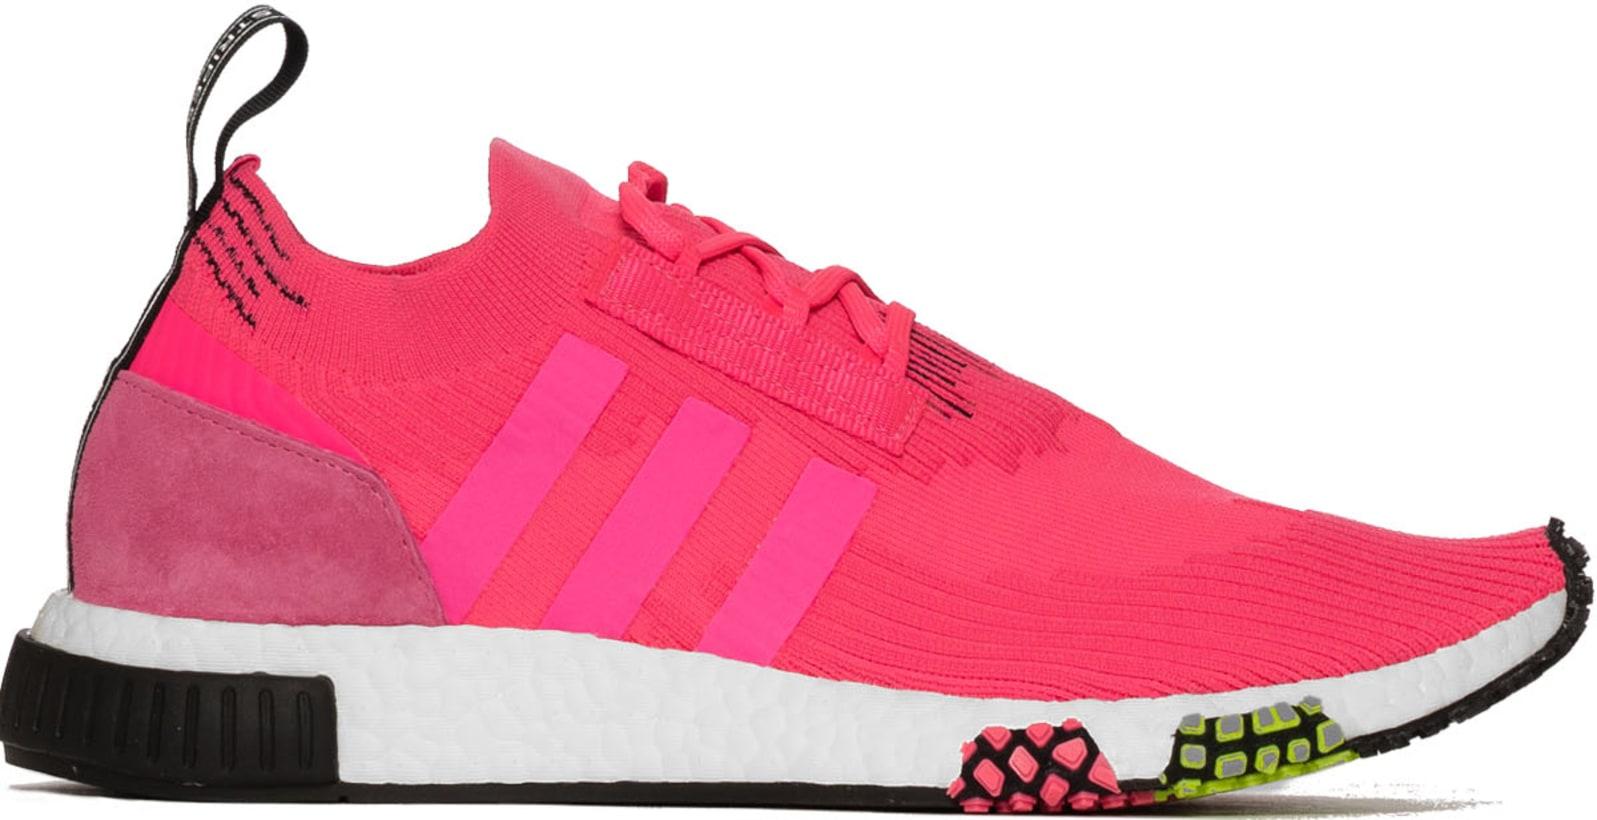 0d23aa747 adidas Originals. NMD Racer Primeknit - Solar Pink Solar Pink Core Black